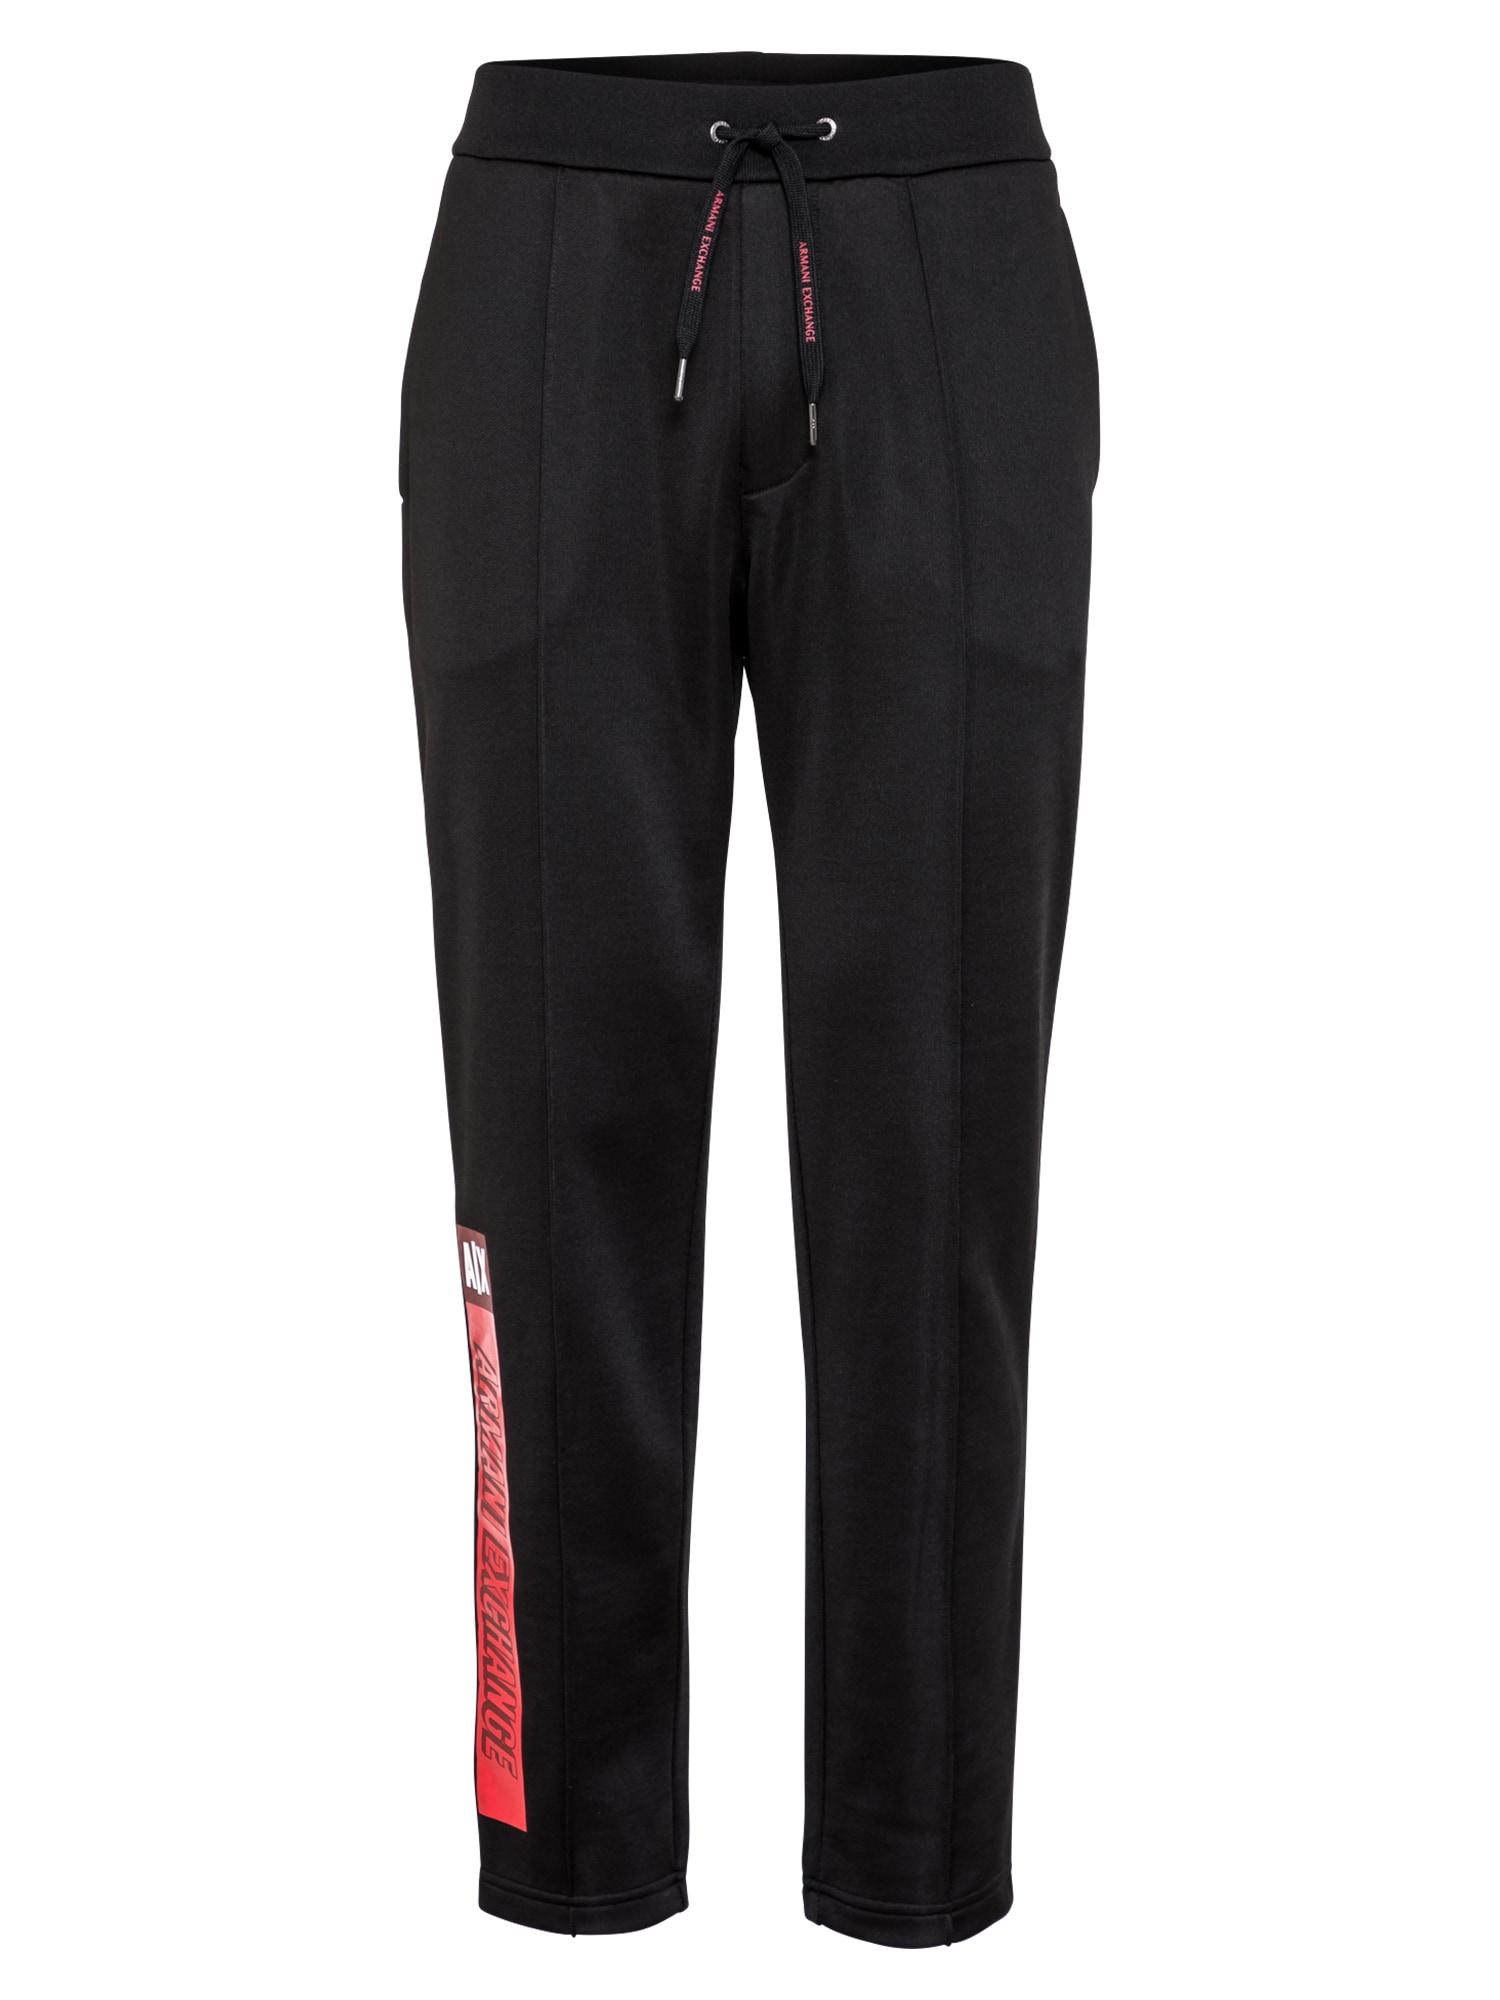 ARMANI EXCHANGE Kelnės juoda / raudona